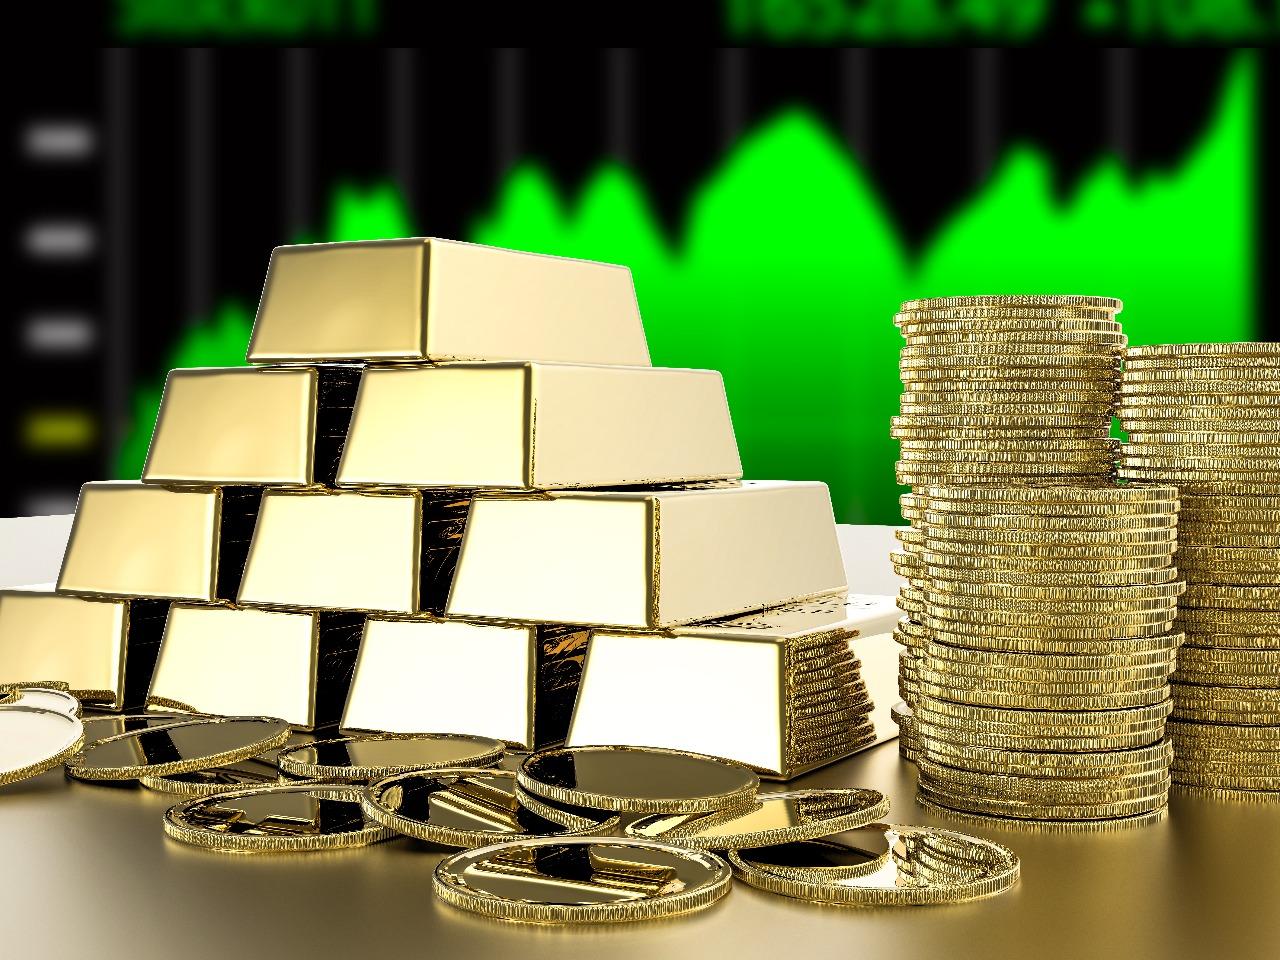 https: img.okeinfo.net content 2019 05 14 320 2055359 harga-emas-naik-1-ke-level-usd1-300-per-ounce-jnOTTMgxA1.jpg